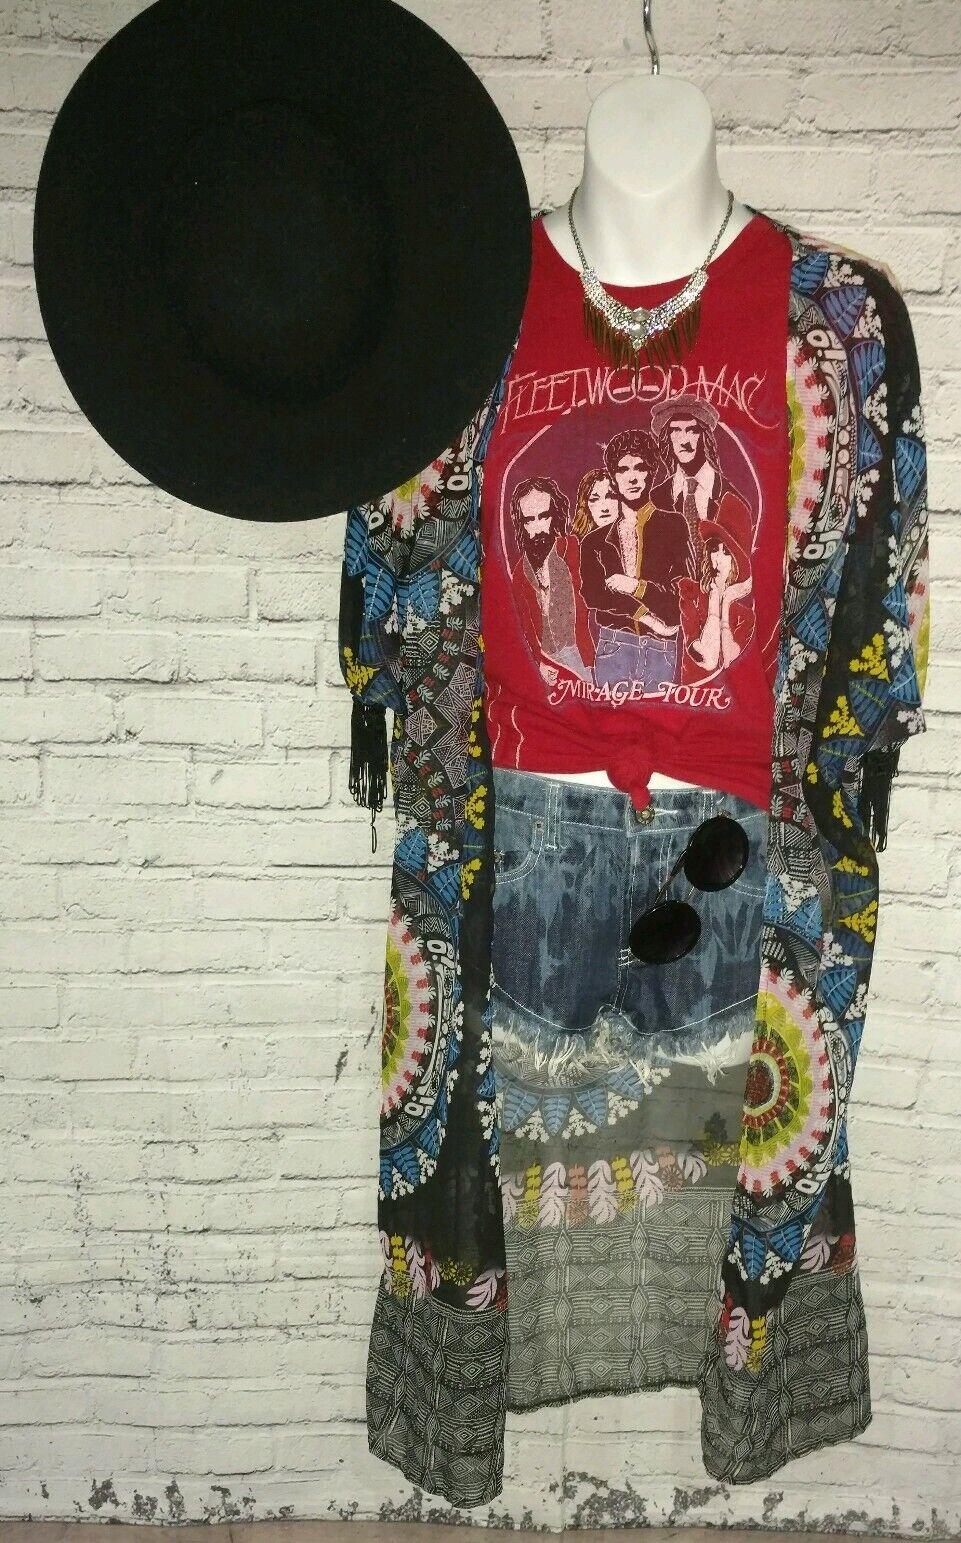 Trunk LTD Fleetwood Mac Mirage Tour Tee Shirt Stevie Nicks Limited Edition rot M